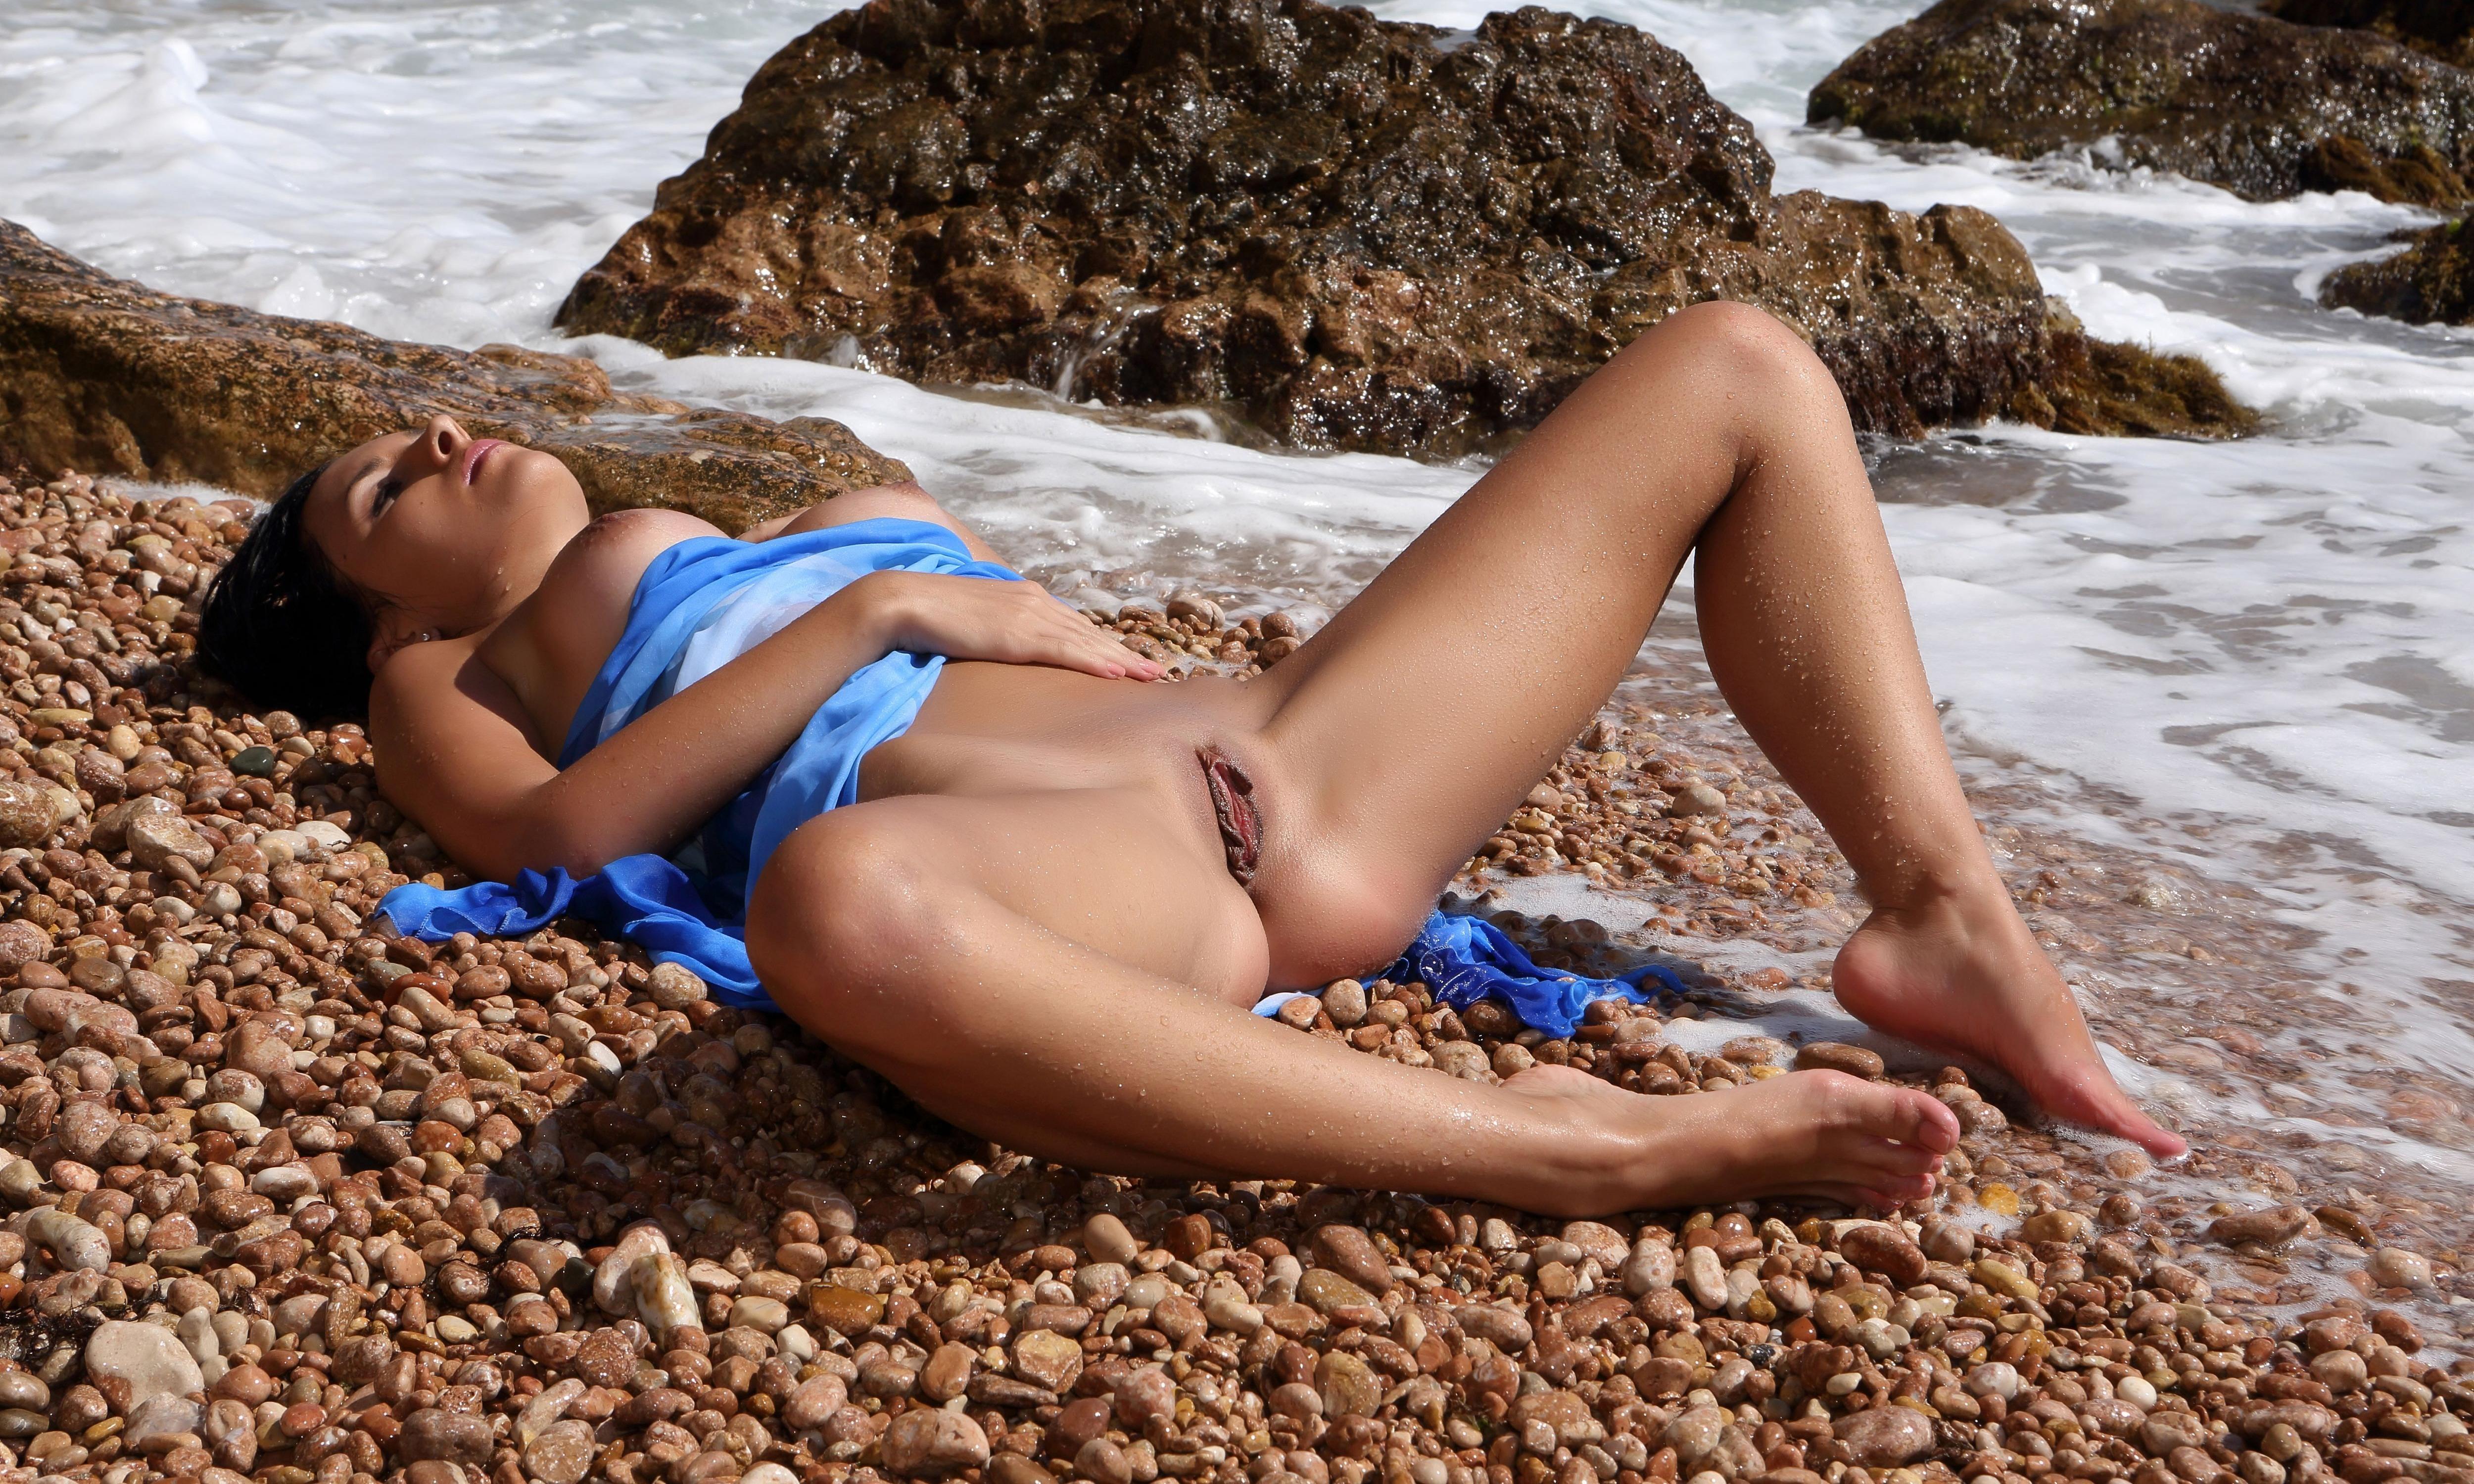 South beach nude-2012